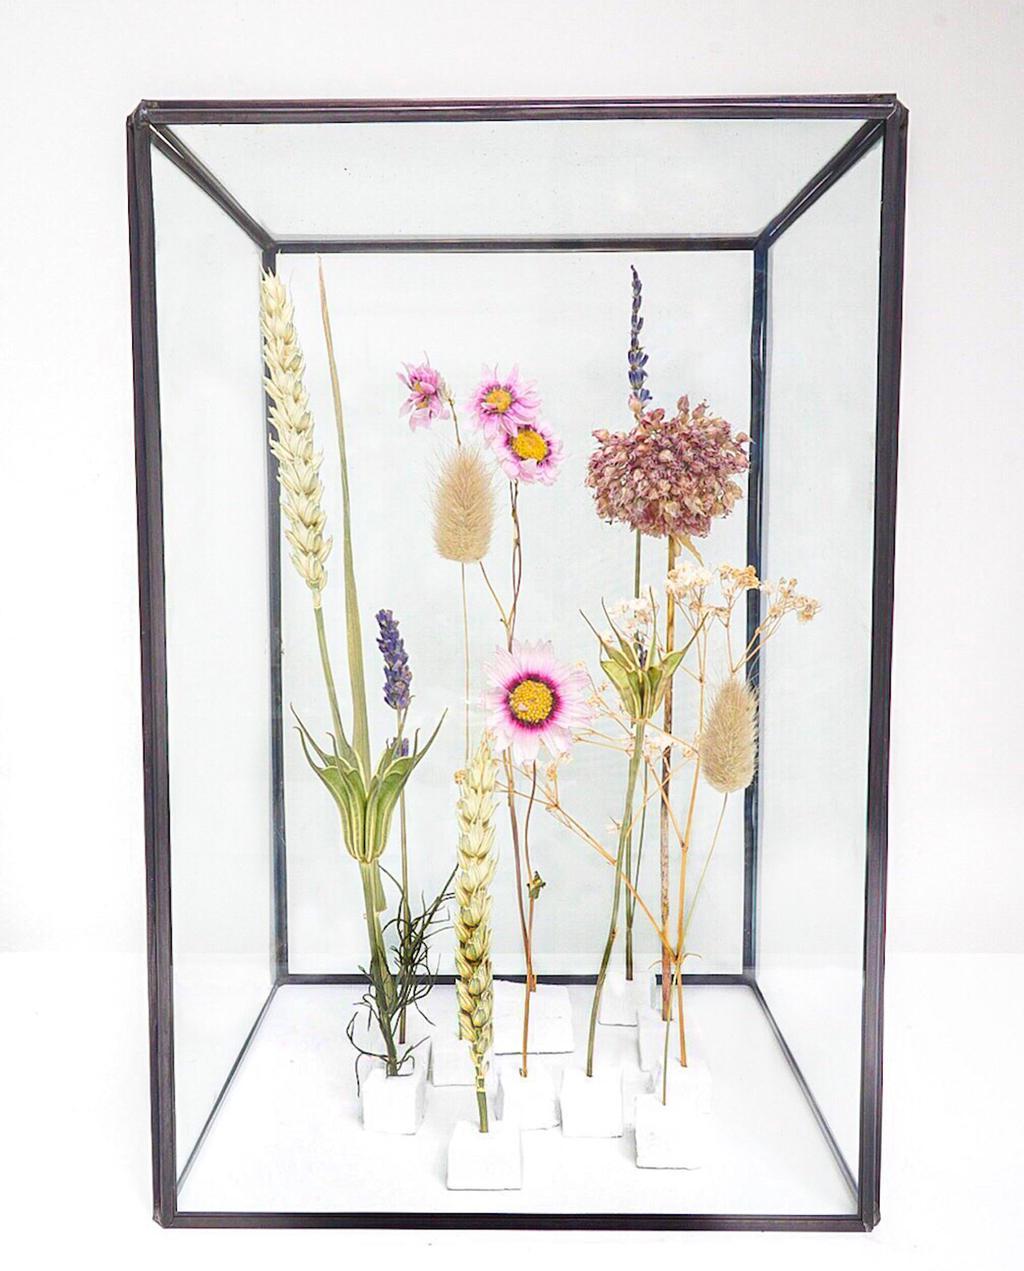 vtwonen | blog kristel: gedroogde bloemen in vitrine